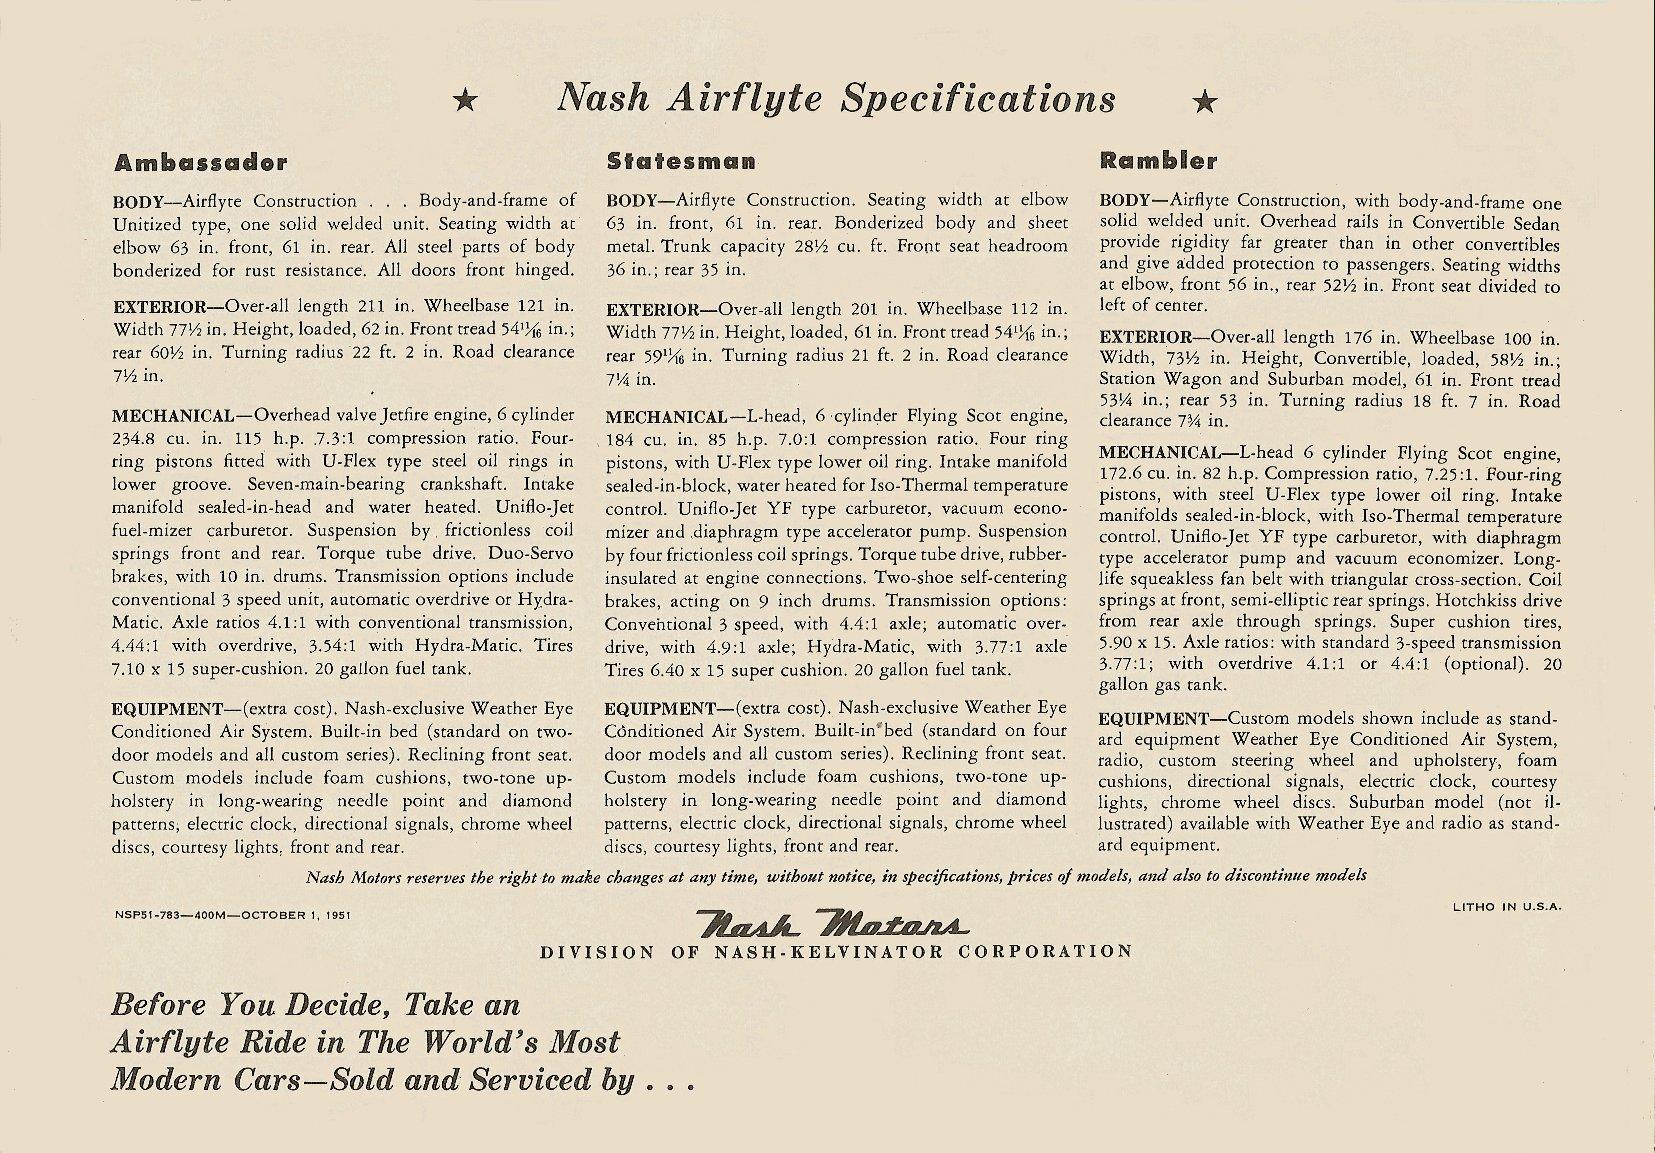 1951 NASH The New NASH Airflytes Sales Catalog NSP51-783-400M – October 1, 1951 Back cover